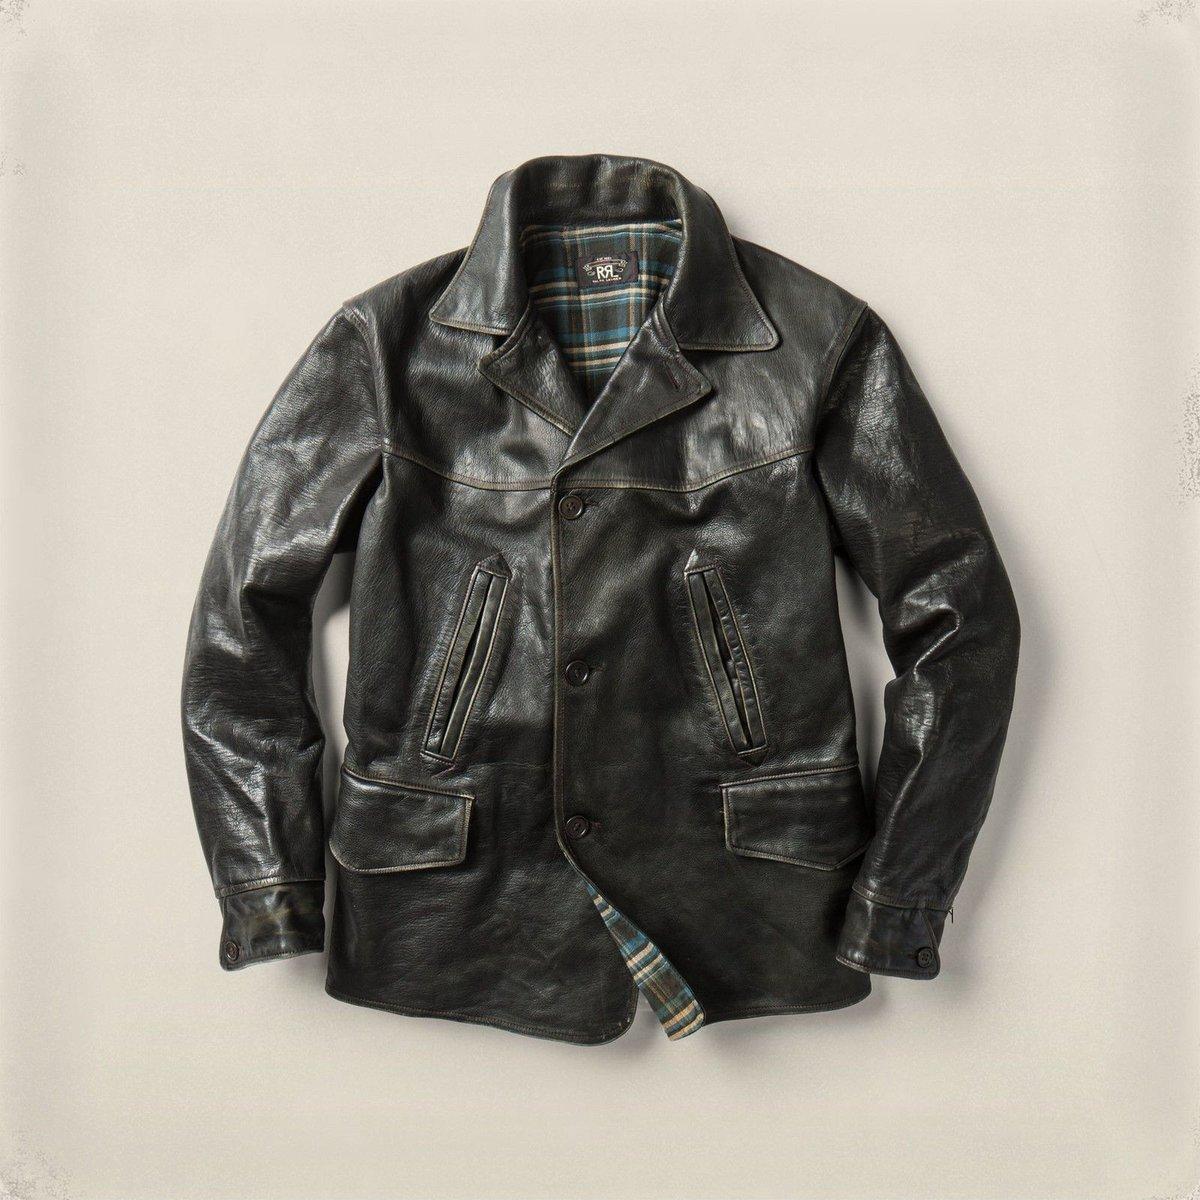 rrl-henderson-leather-jacket-front.jpg